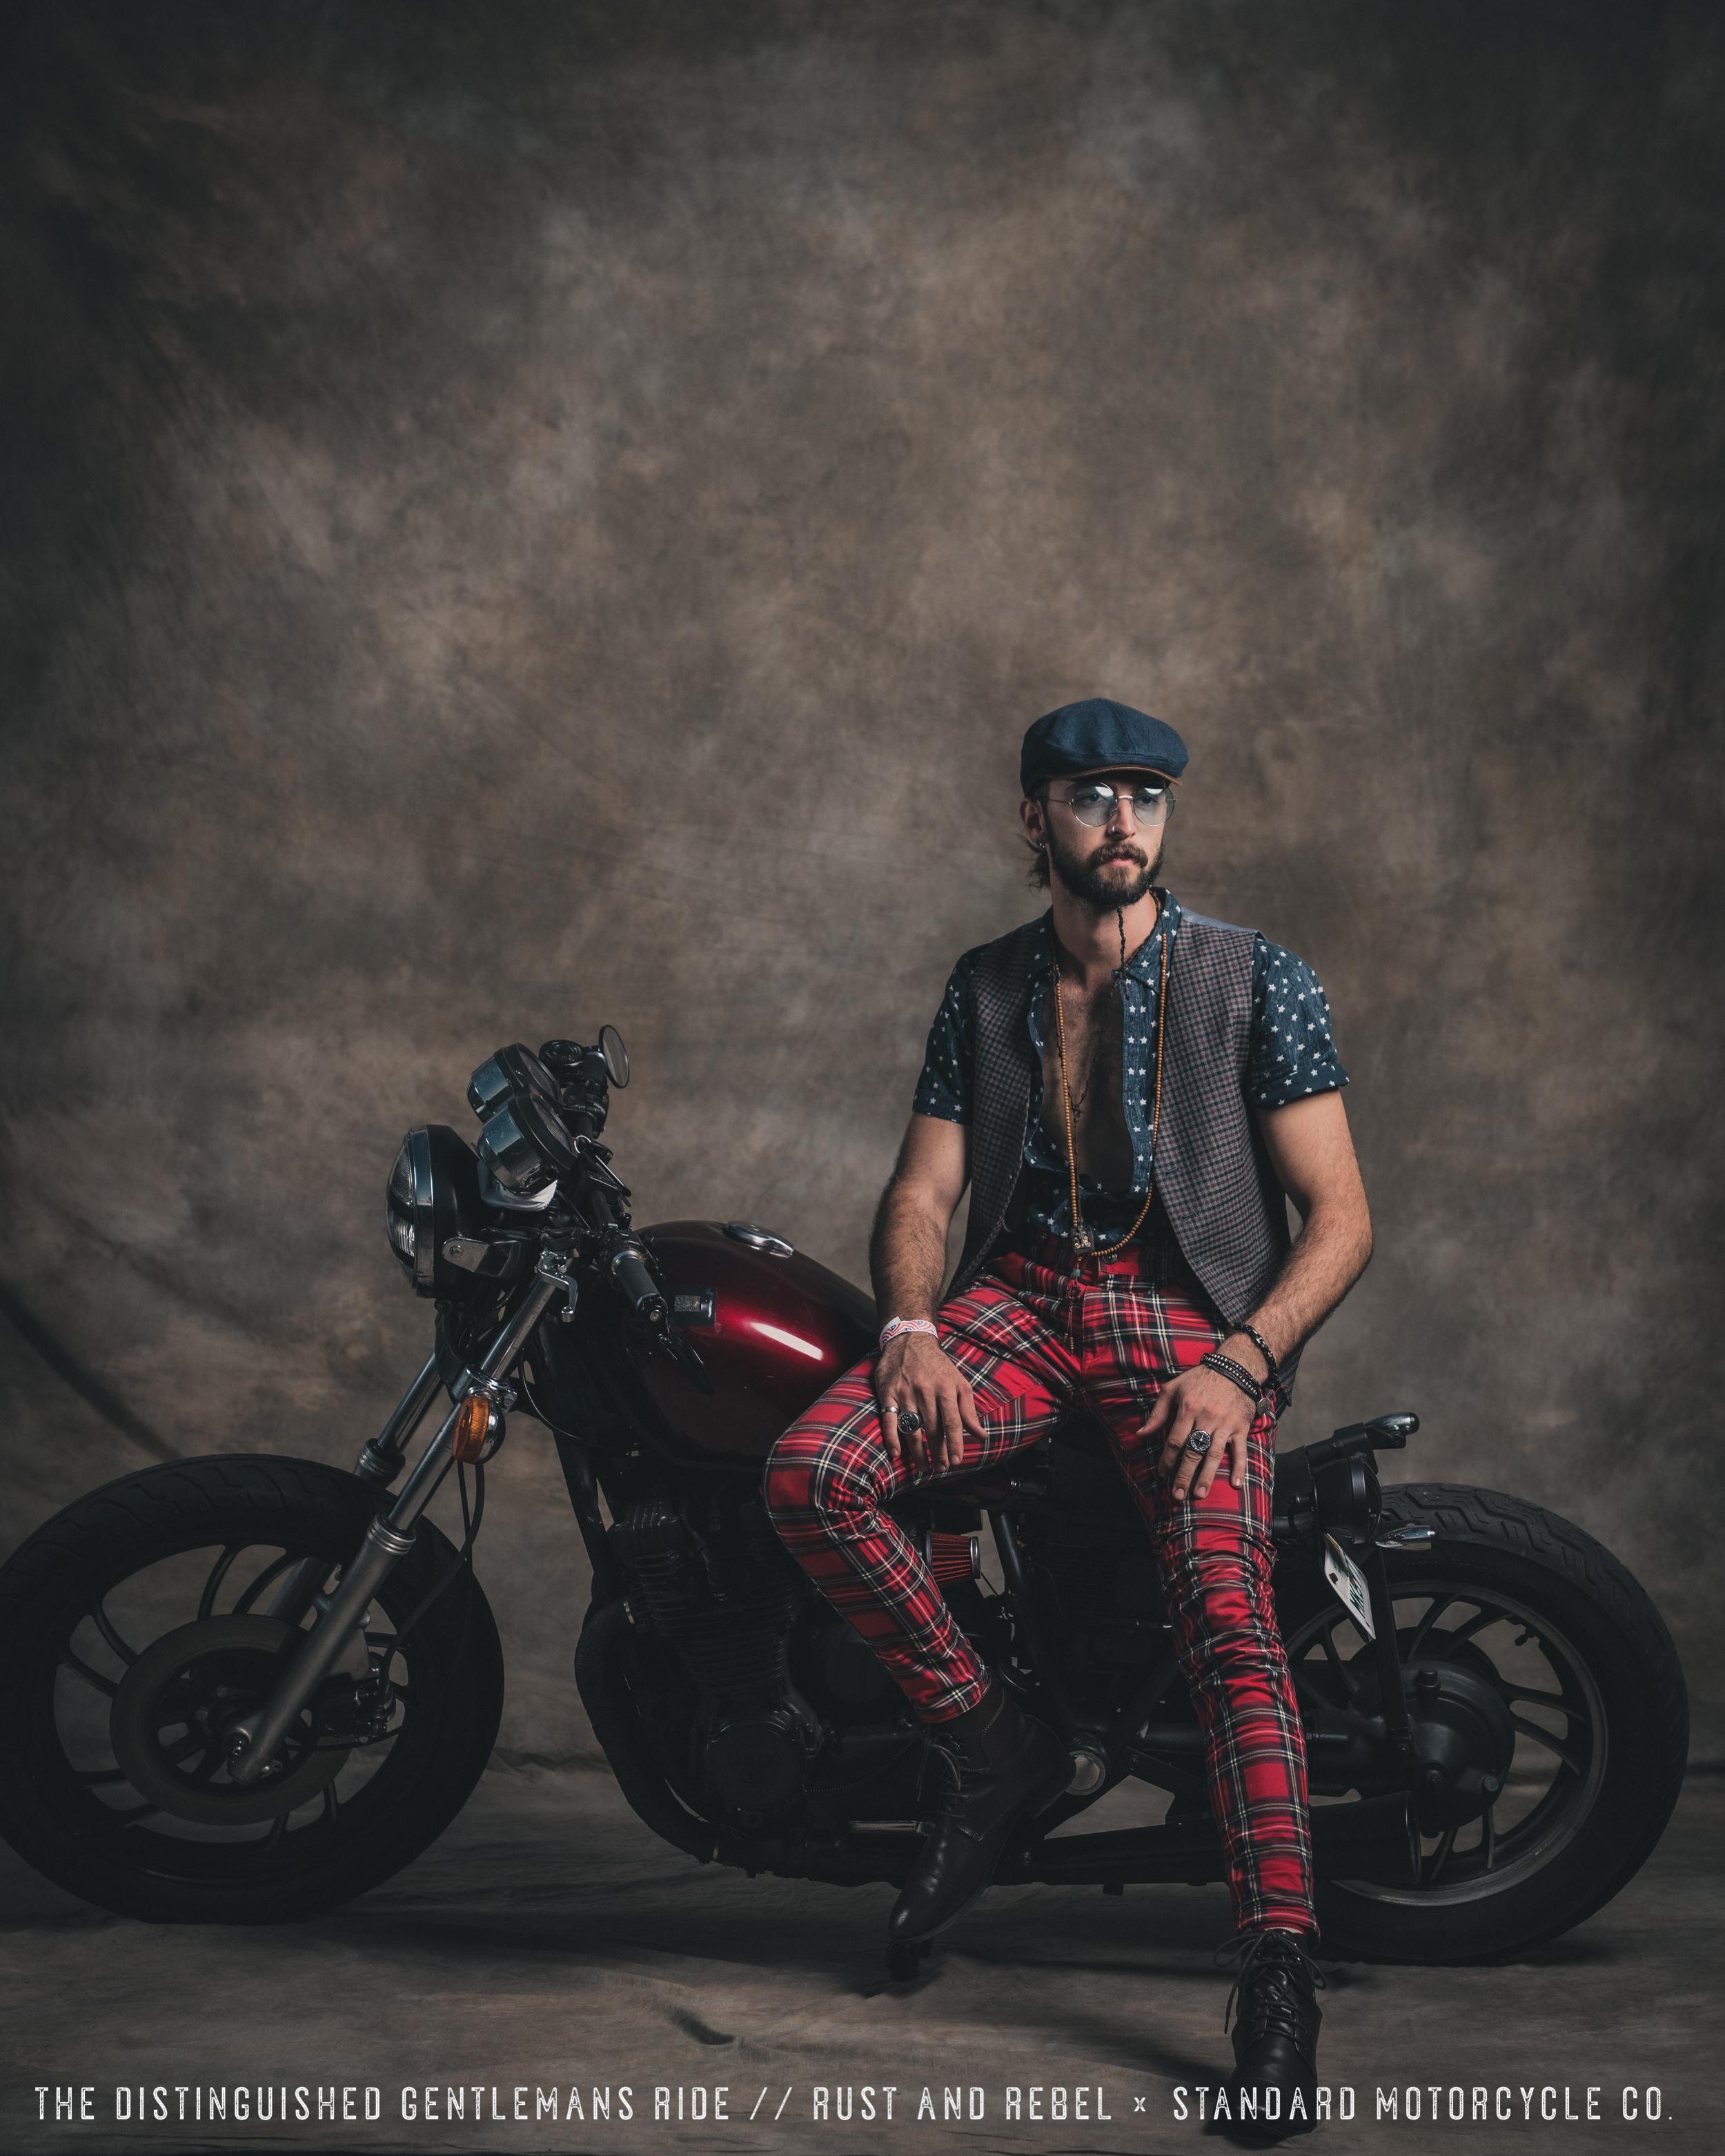 The Distinguished Gentleman's Ride 2019 [PEOPLE - PHOTO BY @MIKEDUNNUSA] - 0159.jpg